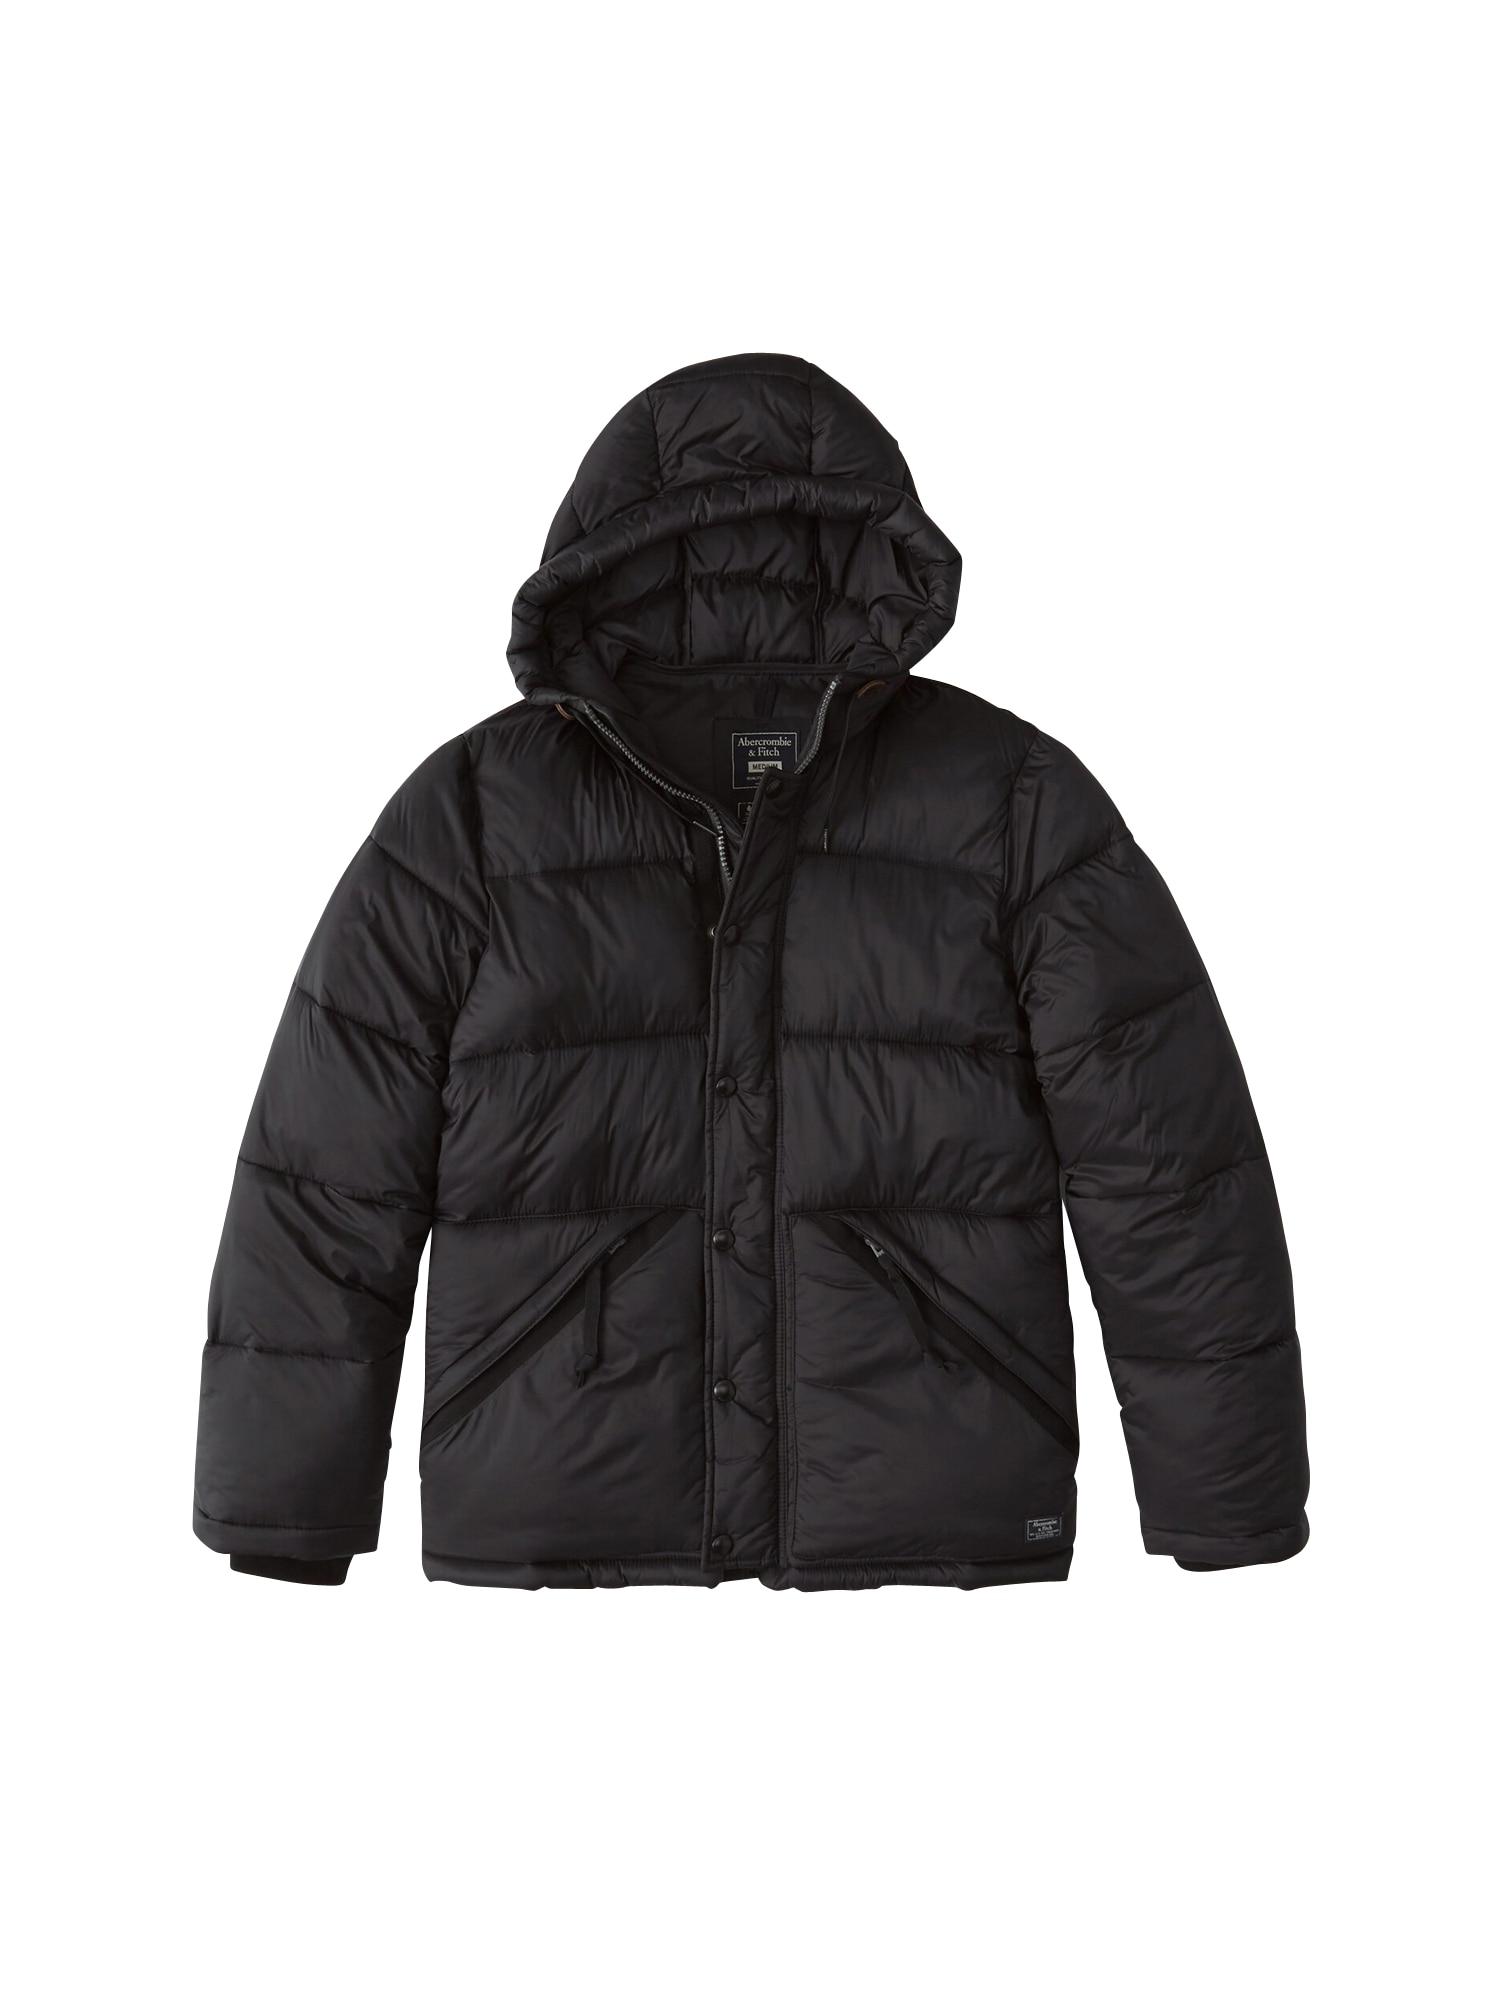 Abercrombie & Fitch Žieminė striukė ' xm19-ultra puffer 2cc ' juoda